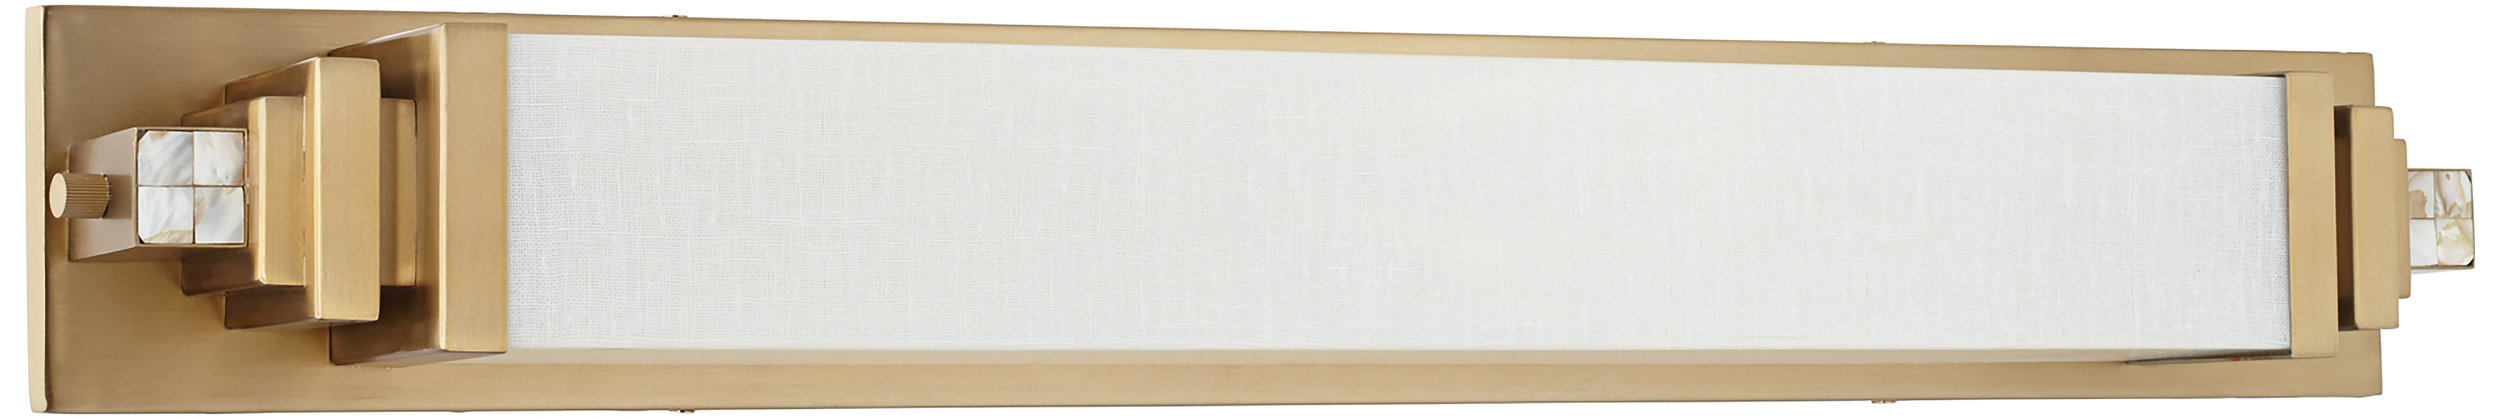 89-6195-2AM[1].jpg